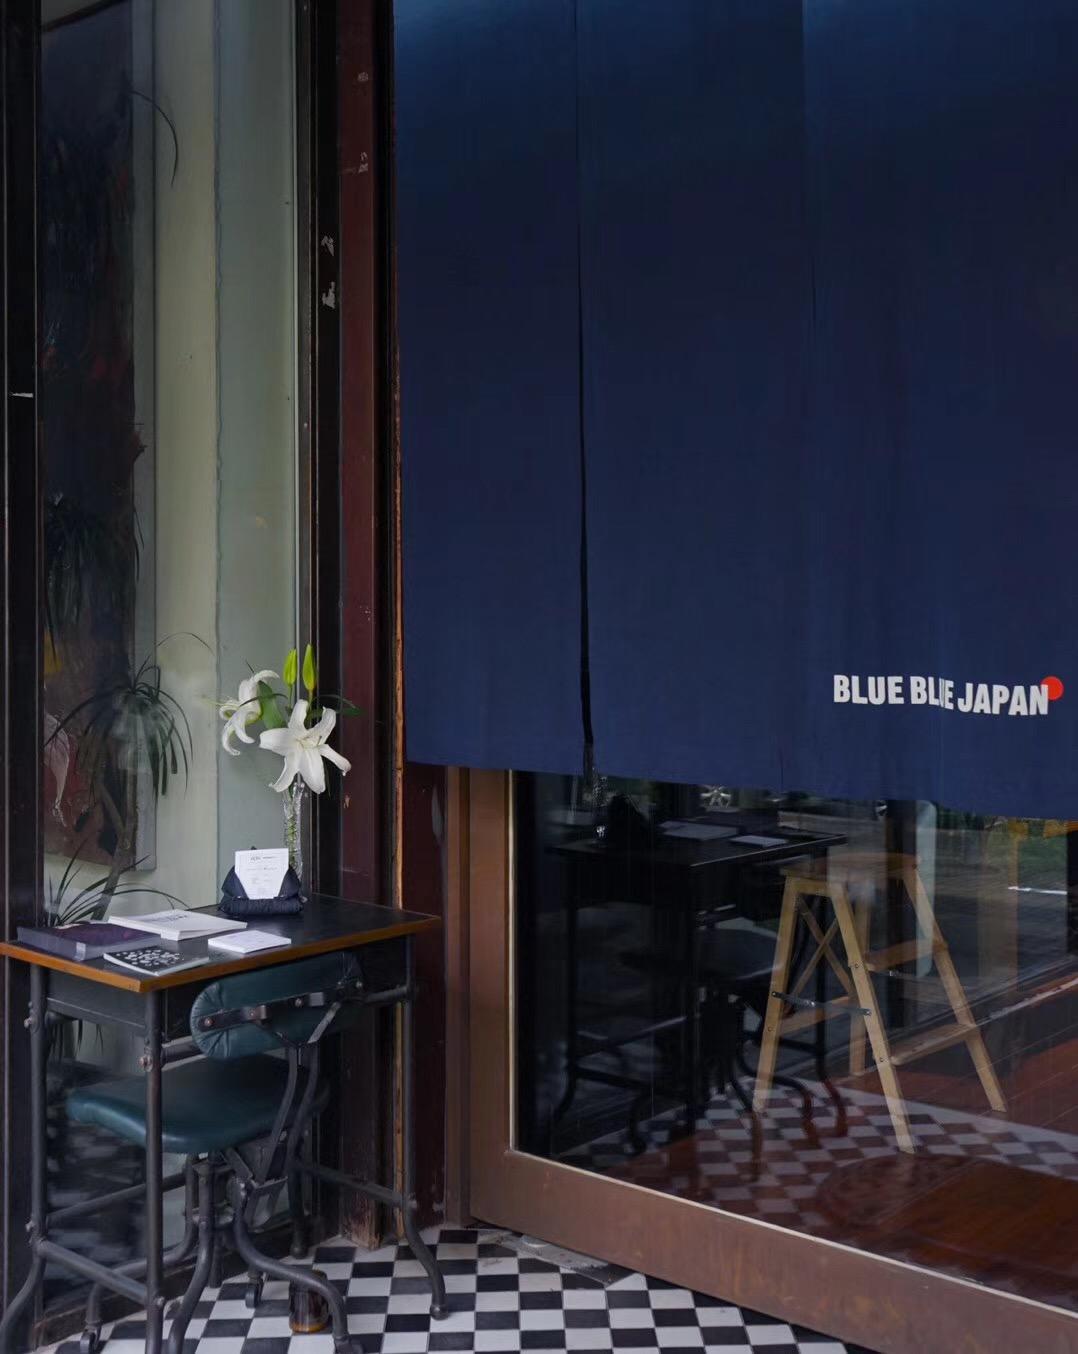 Land scape of BLUE BLUE JAPAN 2